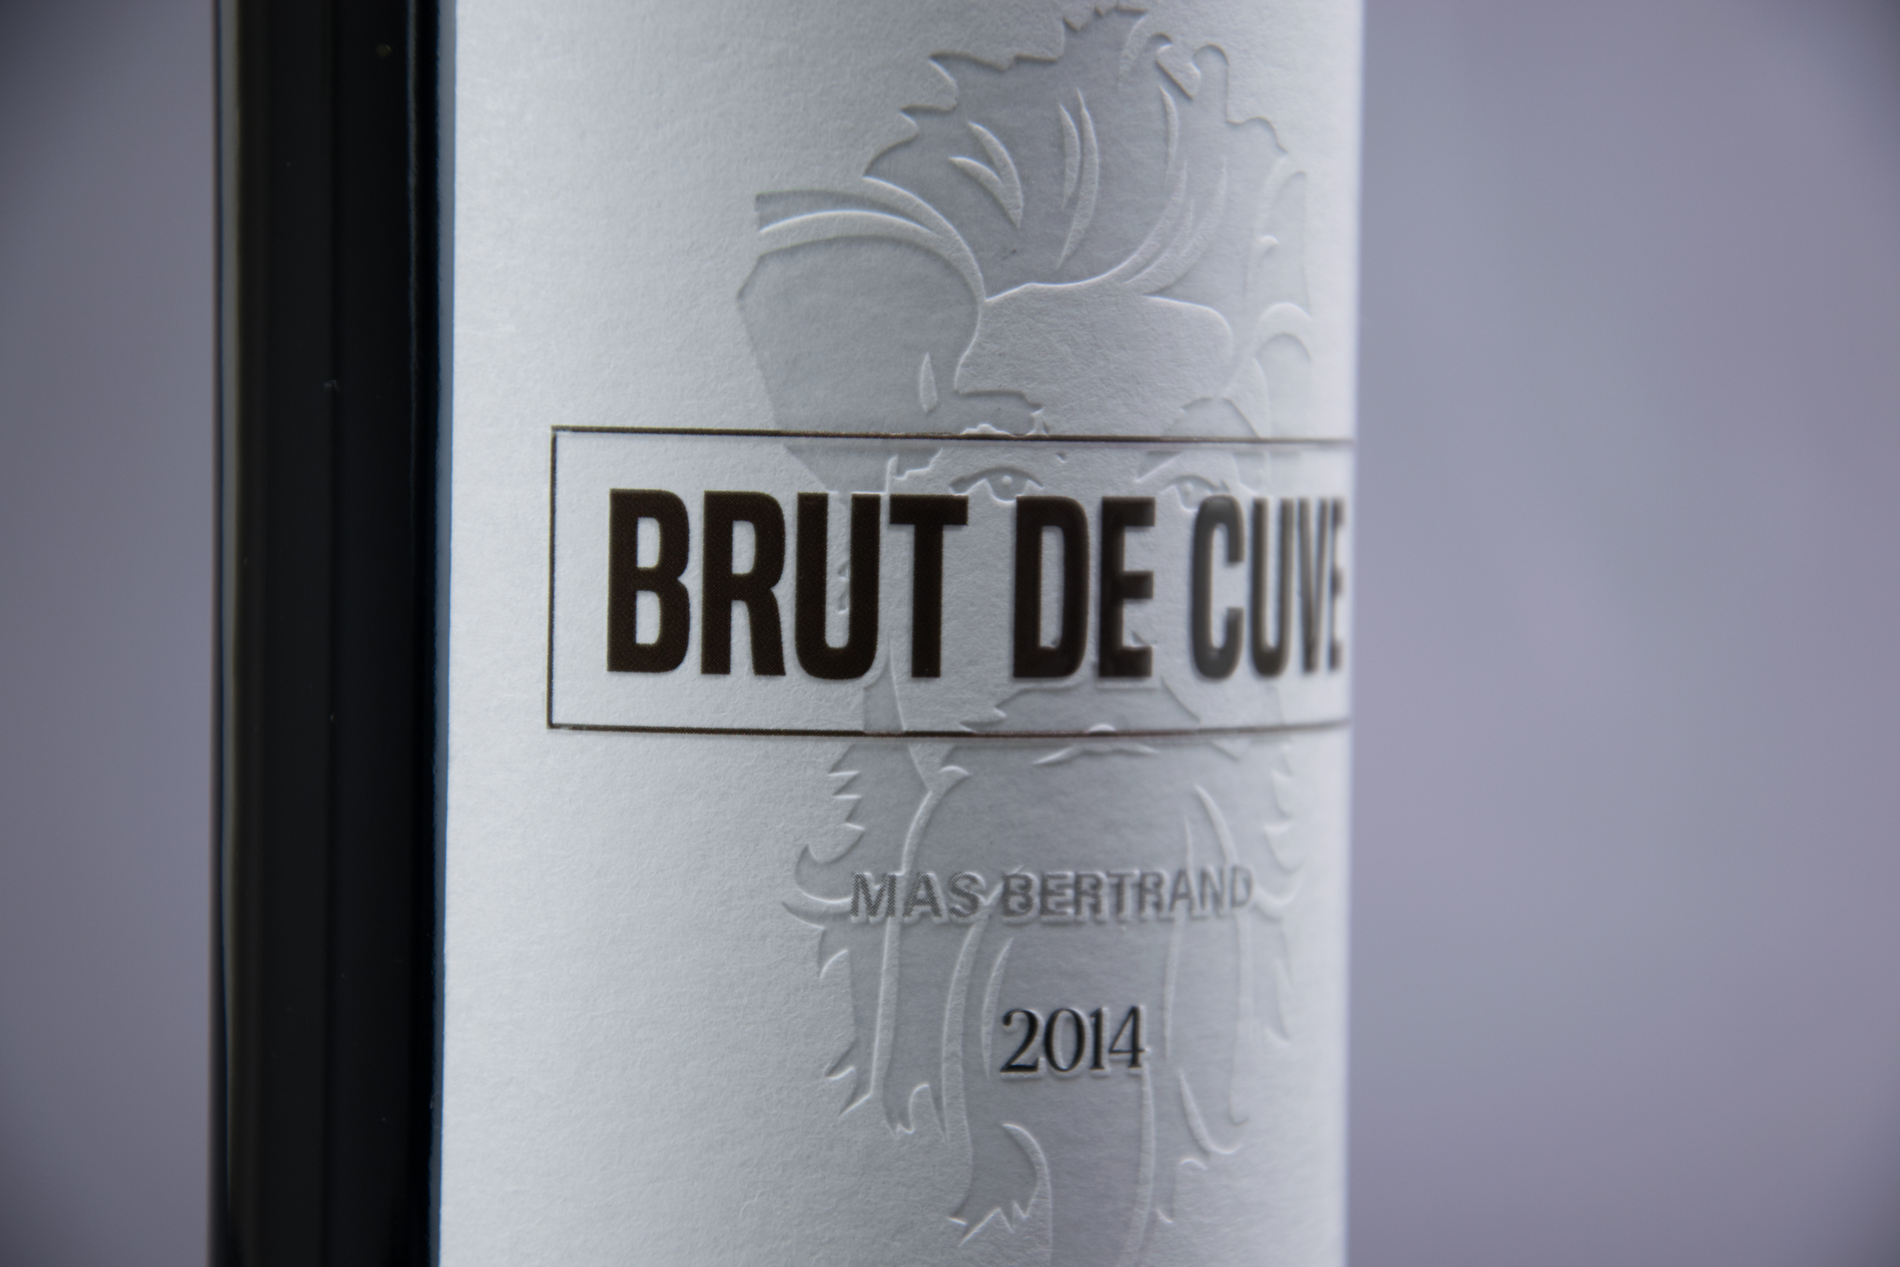 BRUT DE CUVE BDX-3